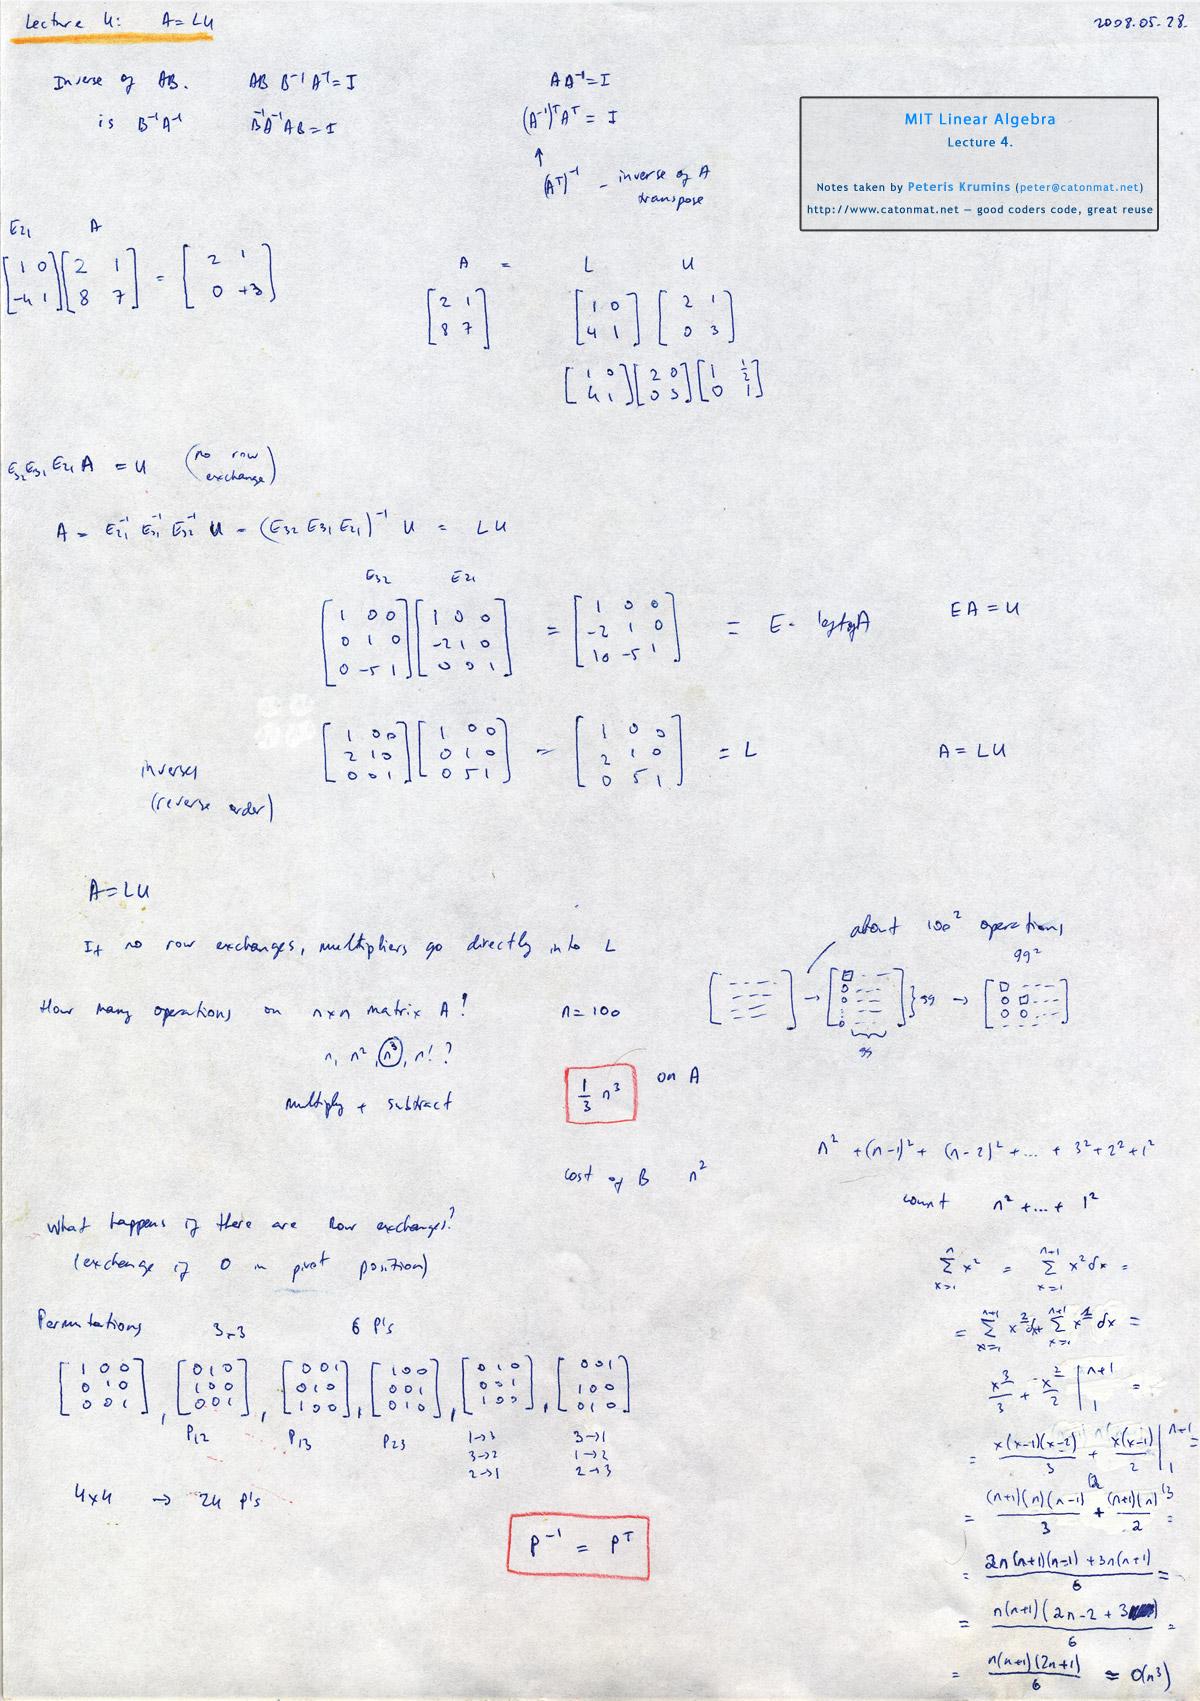 Mit Linear Algebra Lecture 4 A Lu Factorization